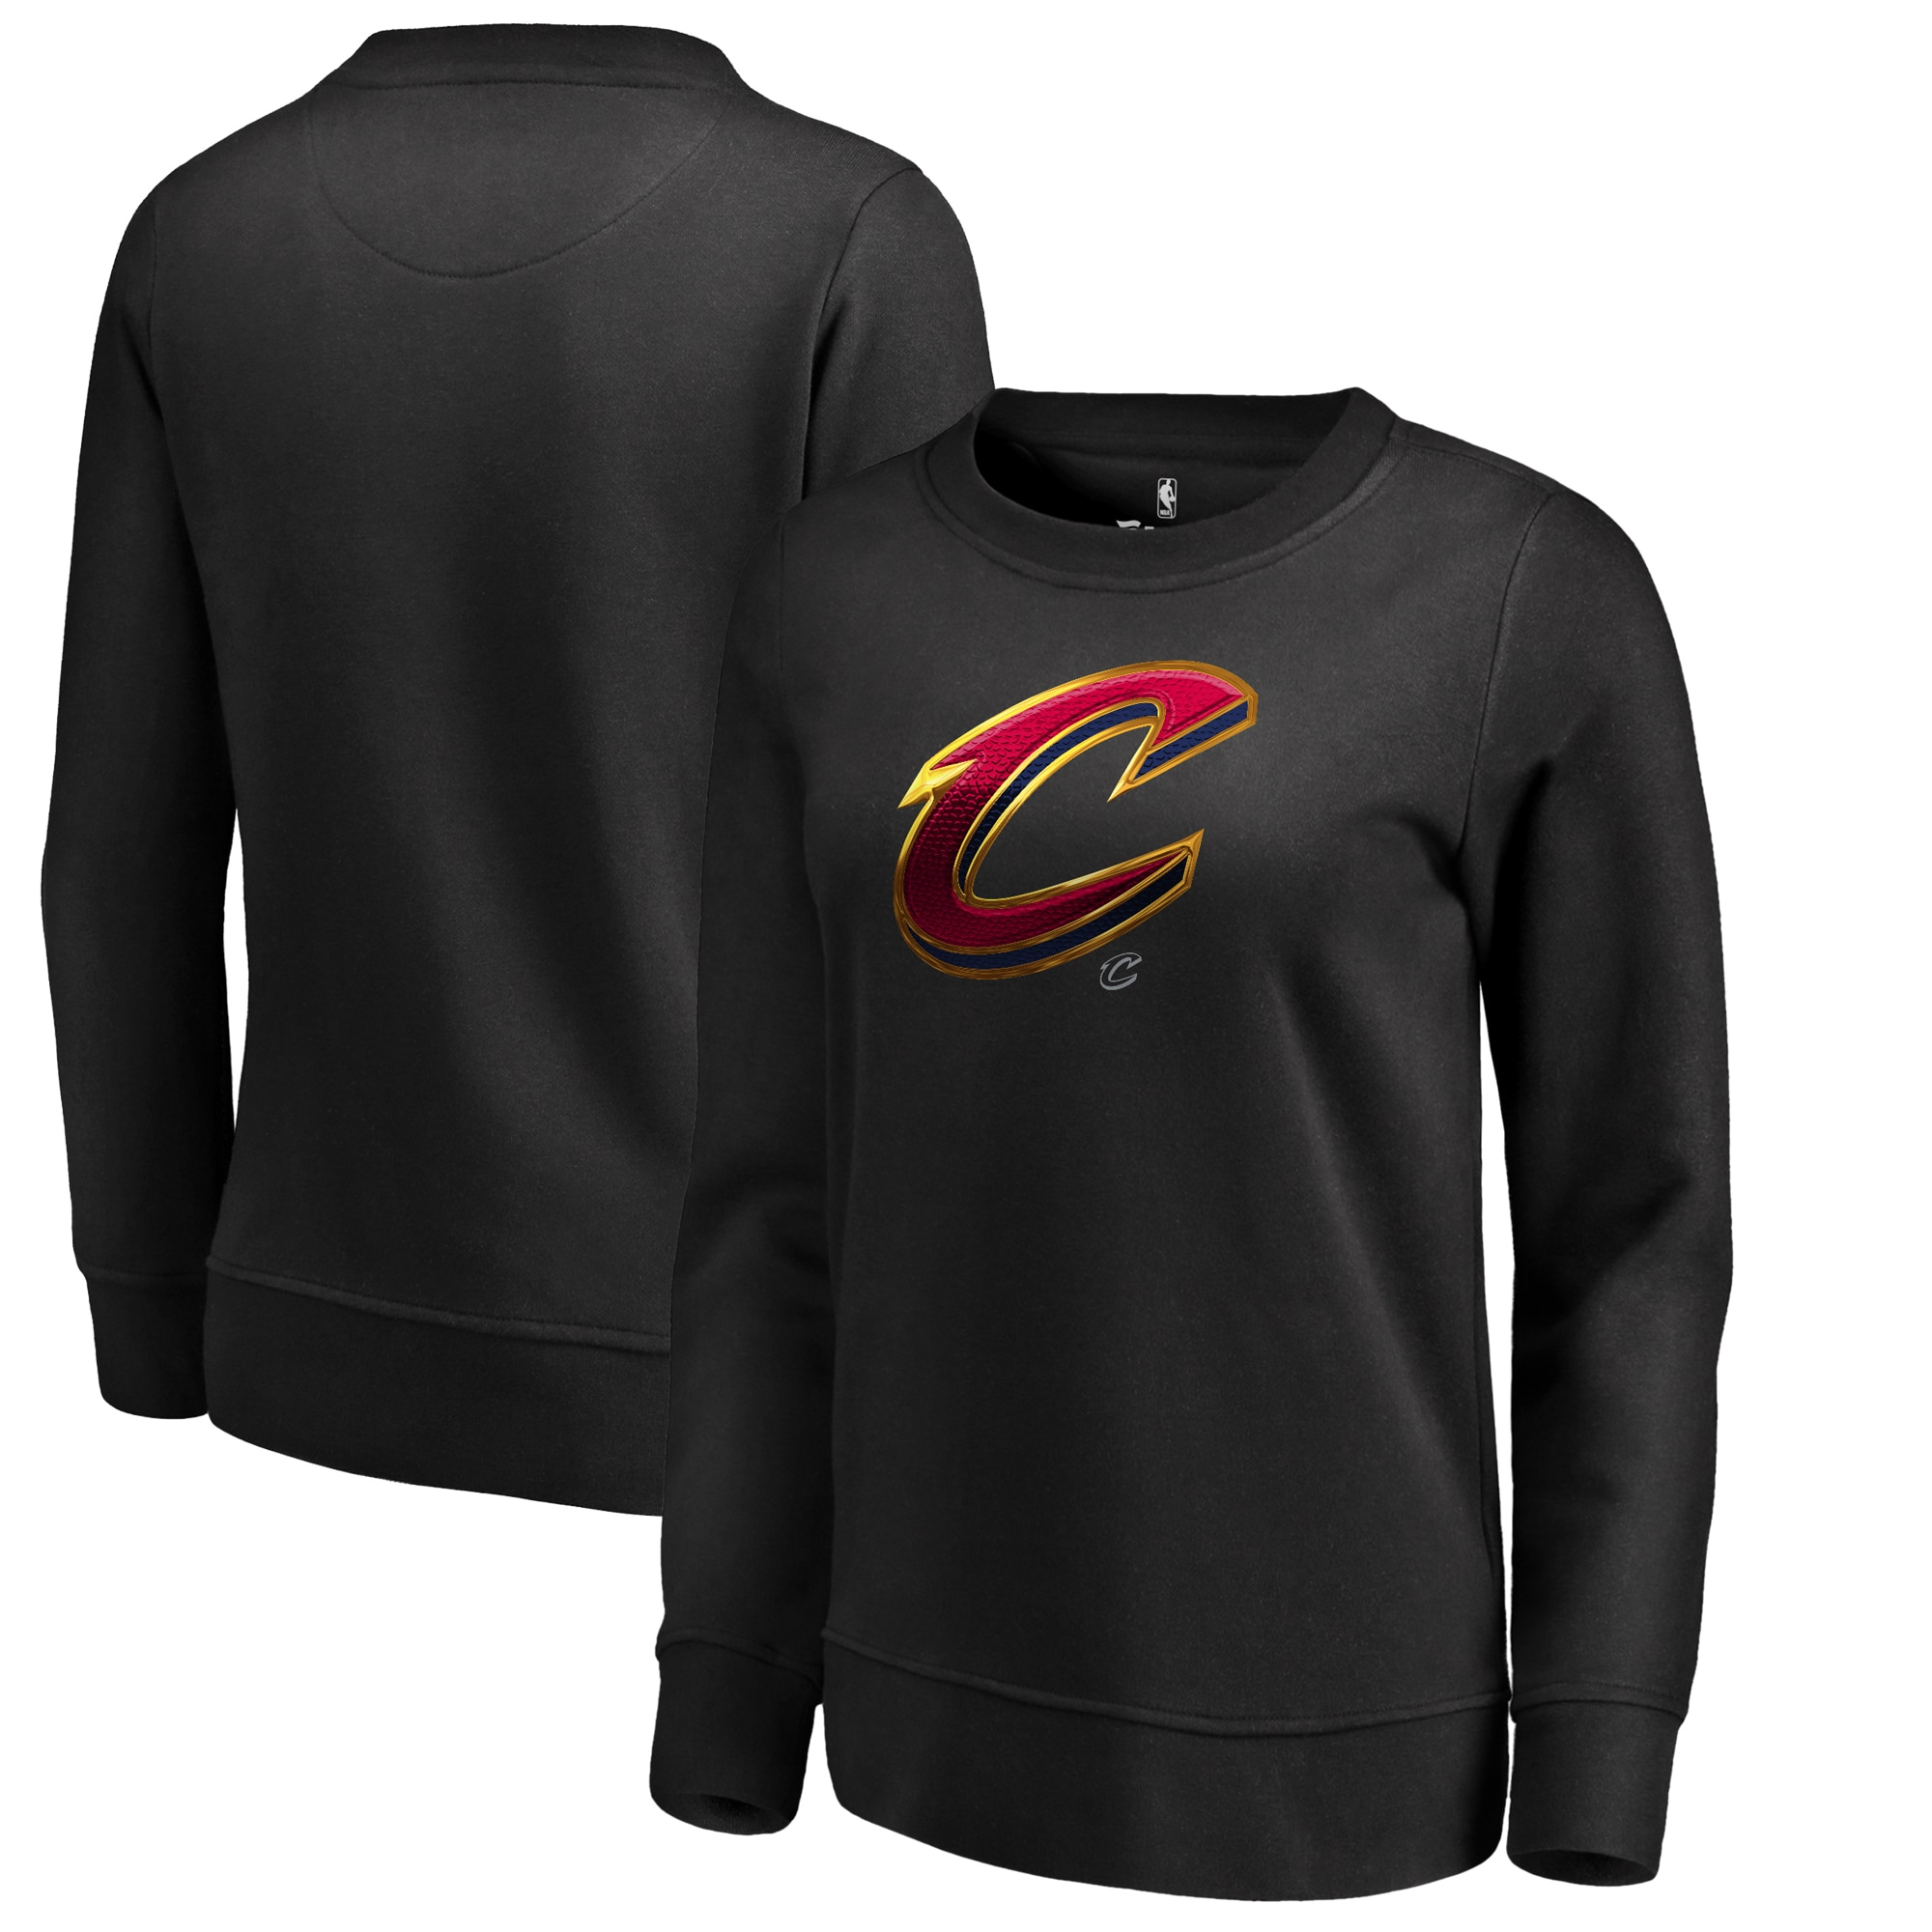 Cleveland Cavaliers Fanatics Branded Women's Midnight Mascot Pullover Sweatshirt - Black